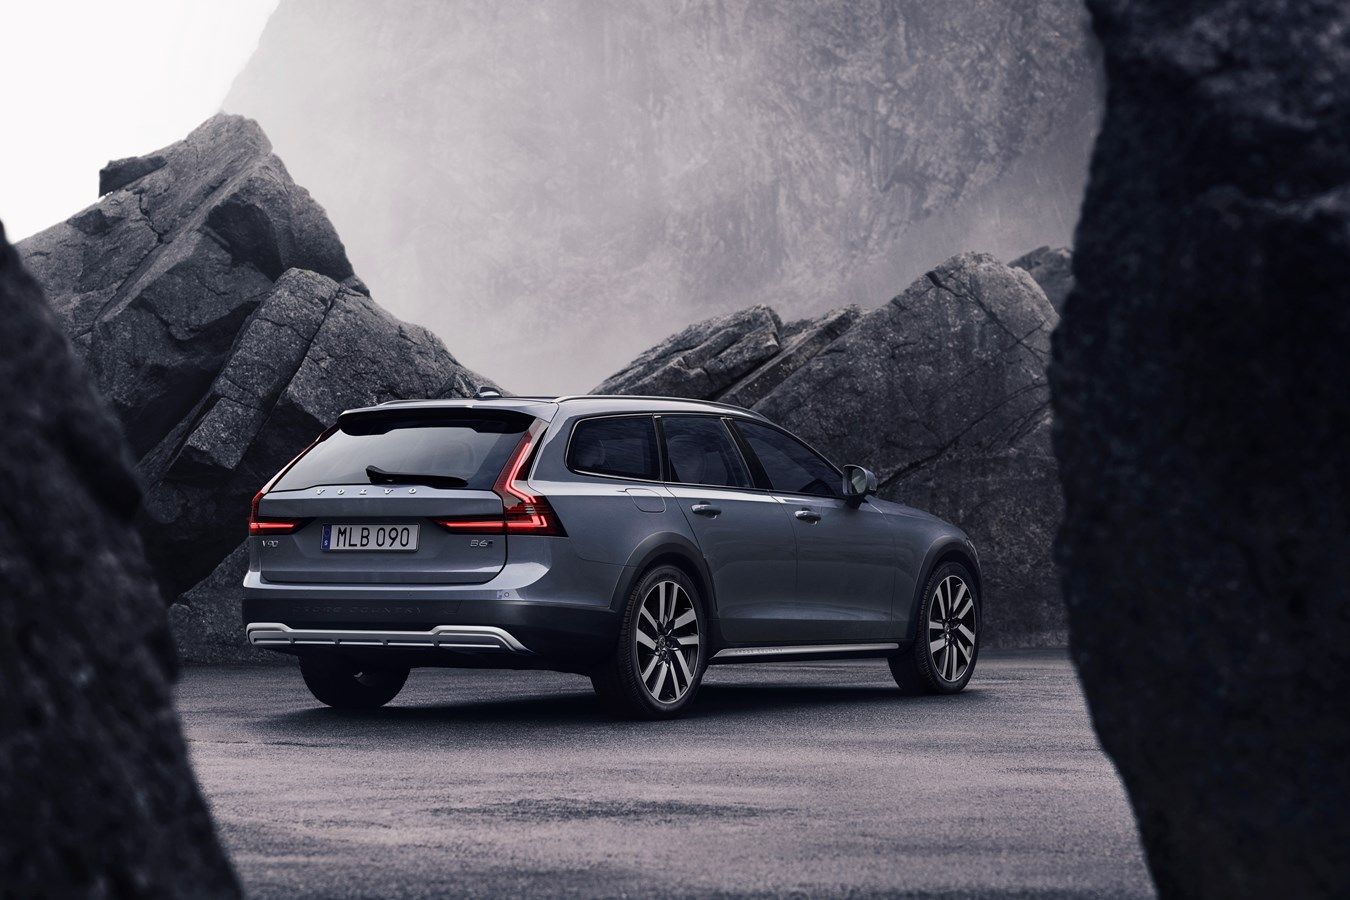 2021 Volvo V90 Specification Images